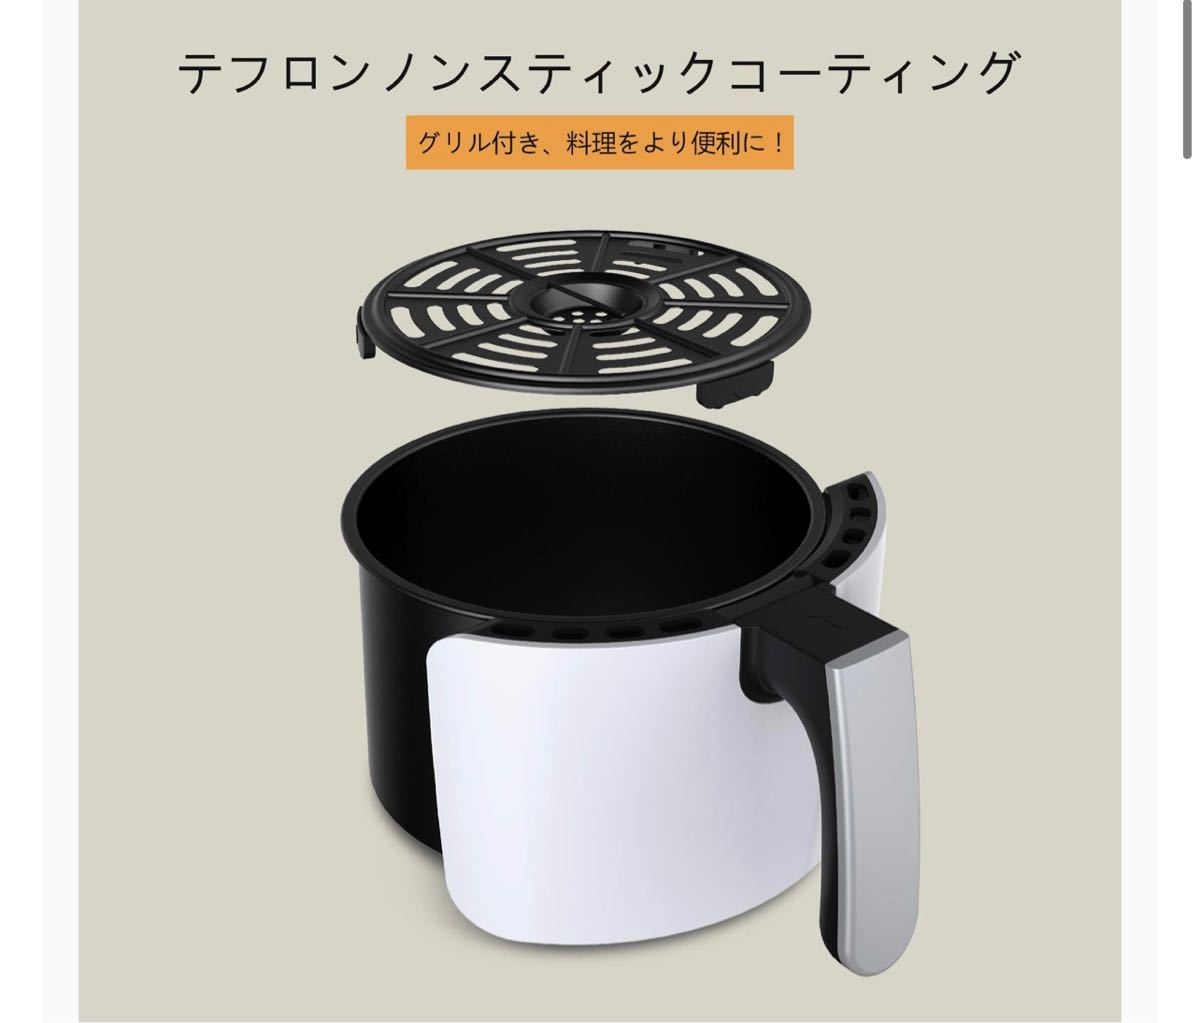 KONKA 電気フライヤー ノンフライヤー 揚げ物 2.2L 油無し 80-200℃温度調節 タイマー機能 エアフライヤー